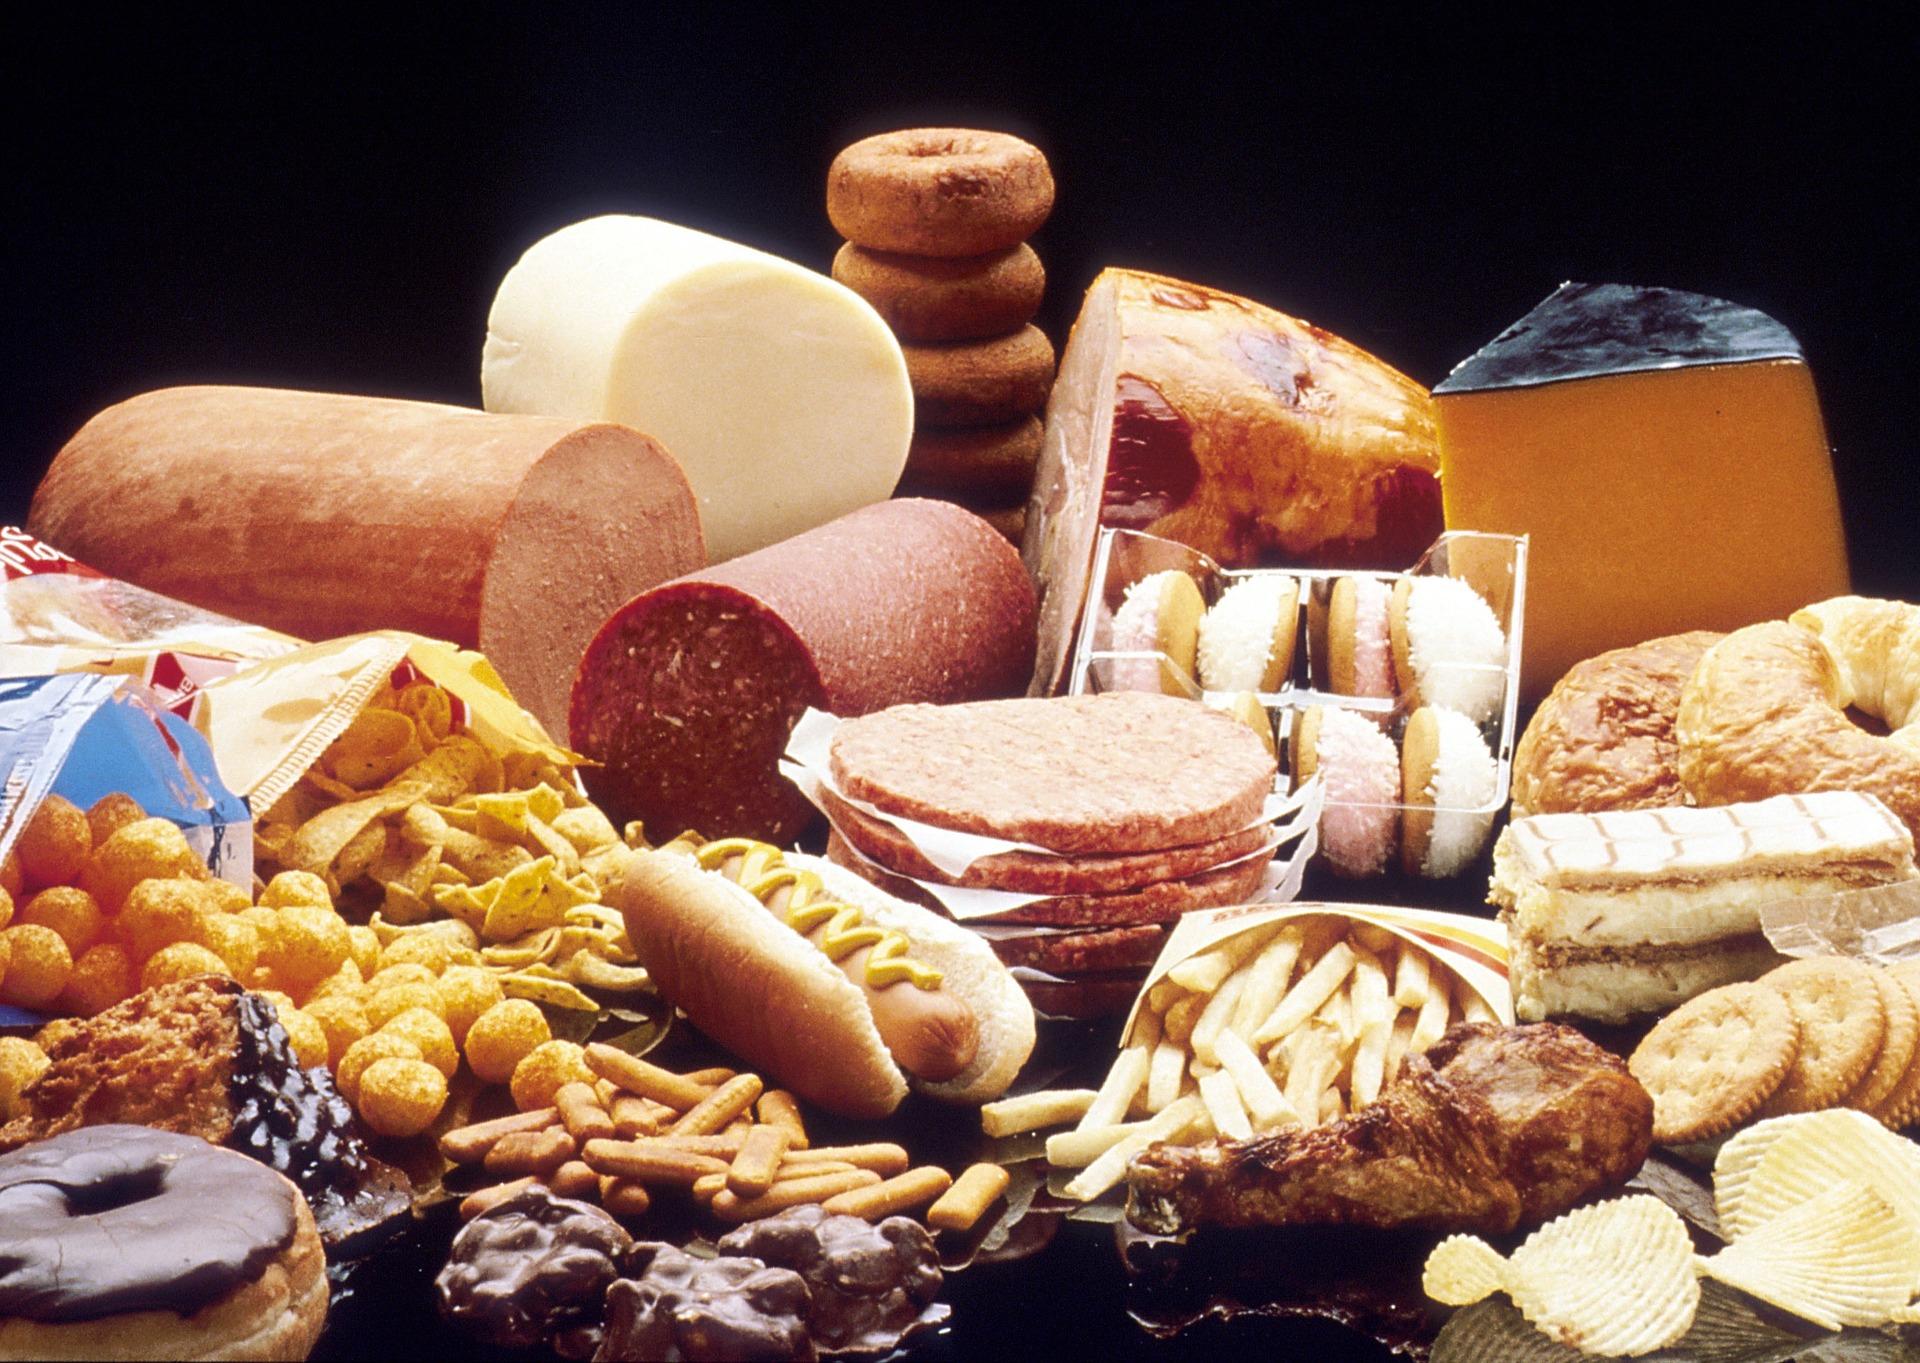 fat-foods-1487599_1920.jpg